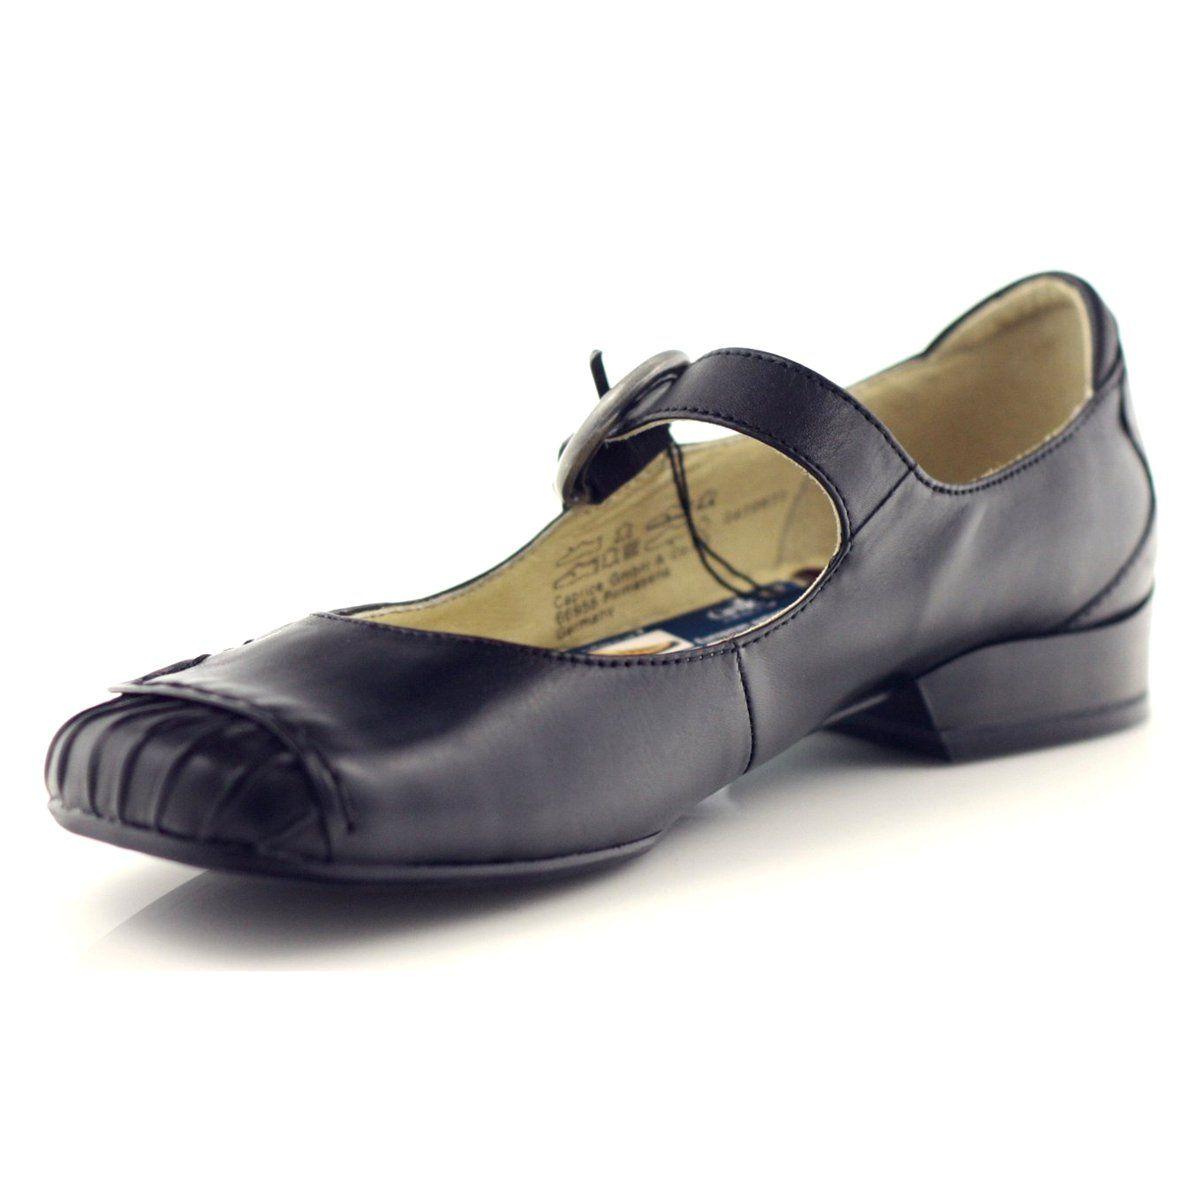 Polbuty Damskie Caprice Polbuty Na Pasek 24206 Czarne Caprice Shoes Dance Shoes Tap Shoes